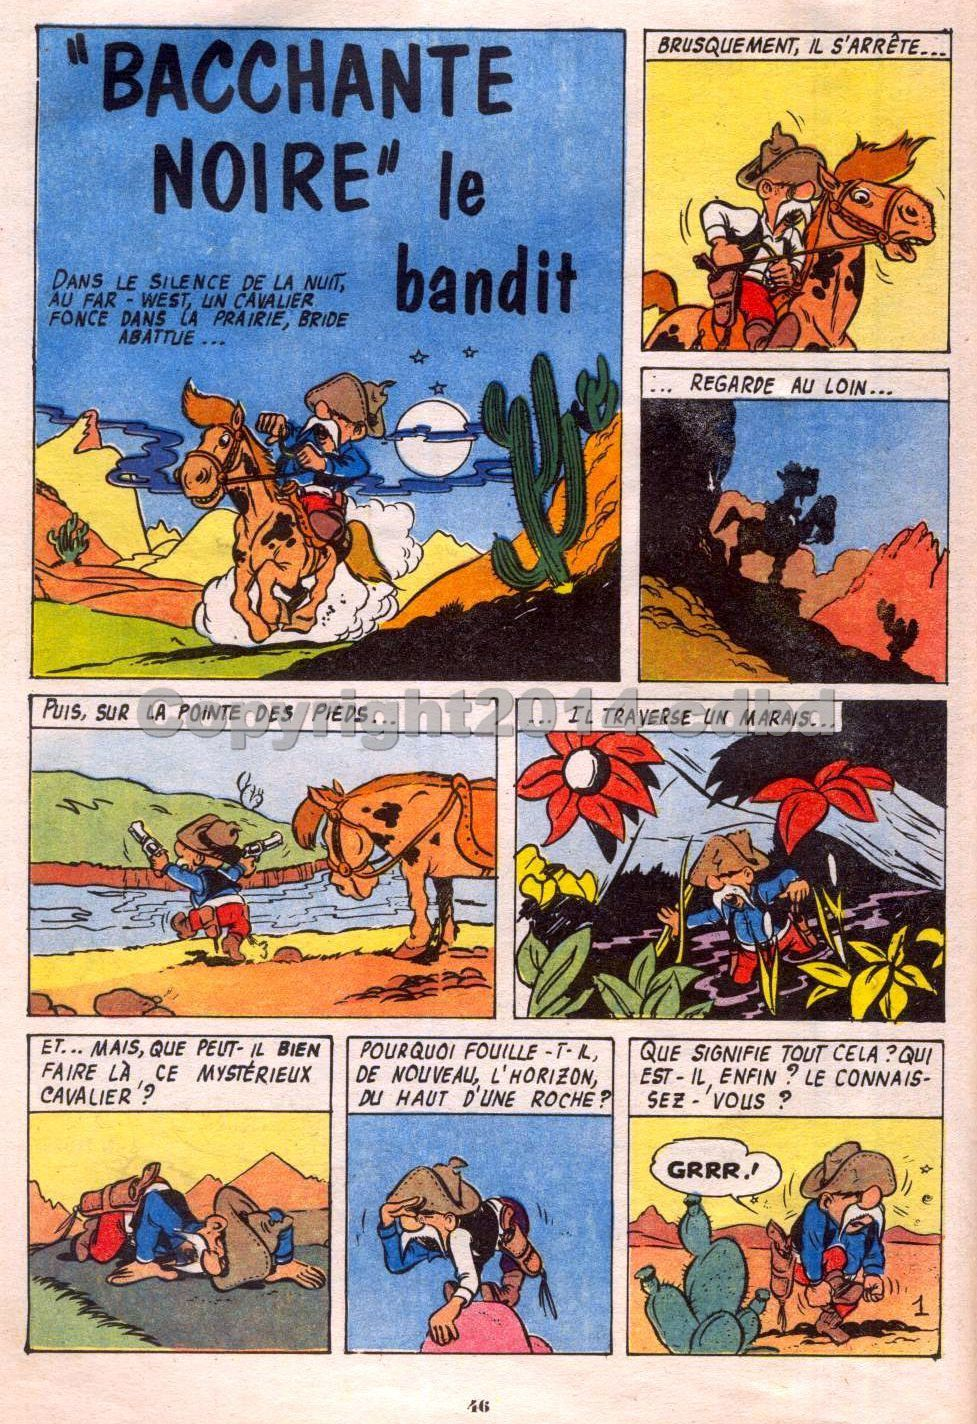 Bimbo trimestriel n°8  d'Octobre 1957- Pages 43 à 59